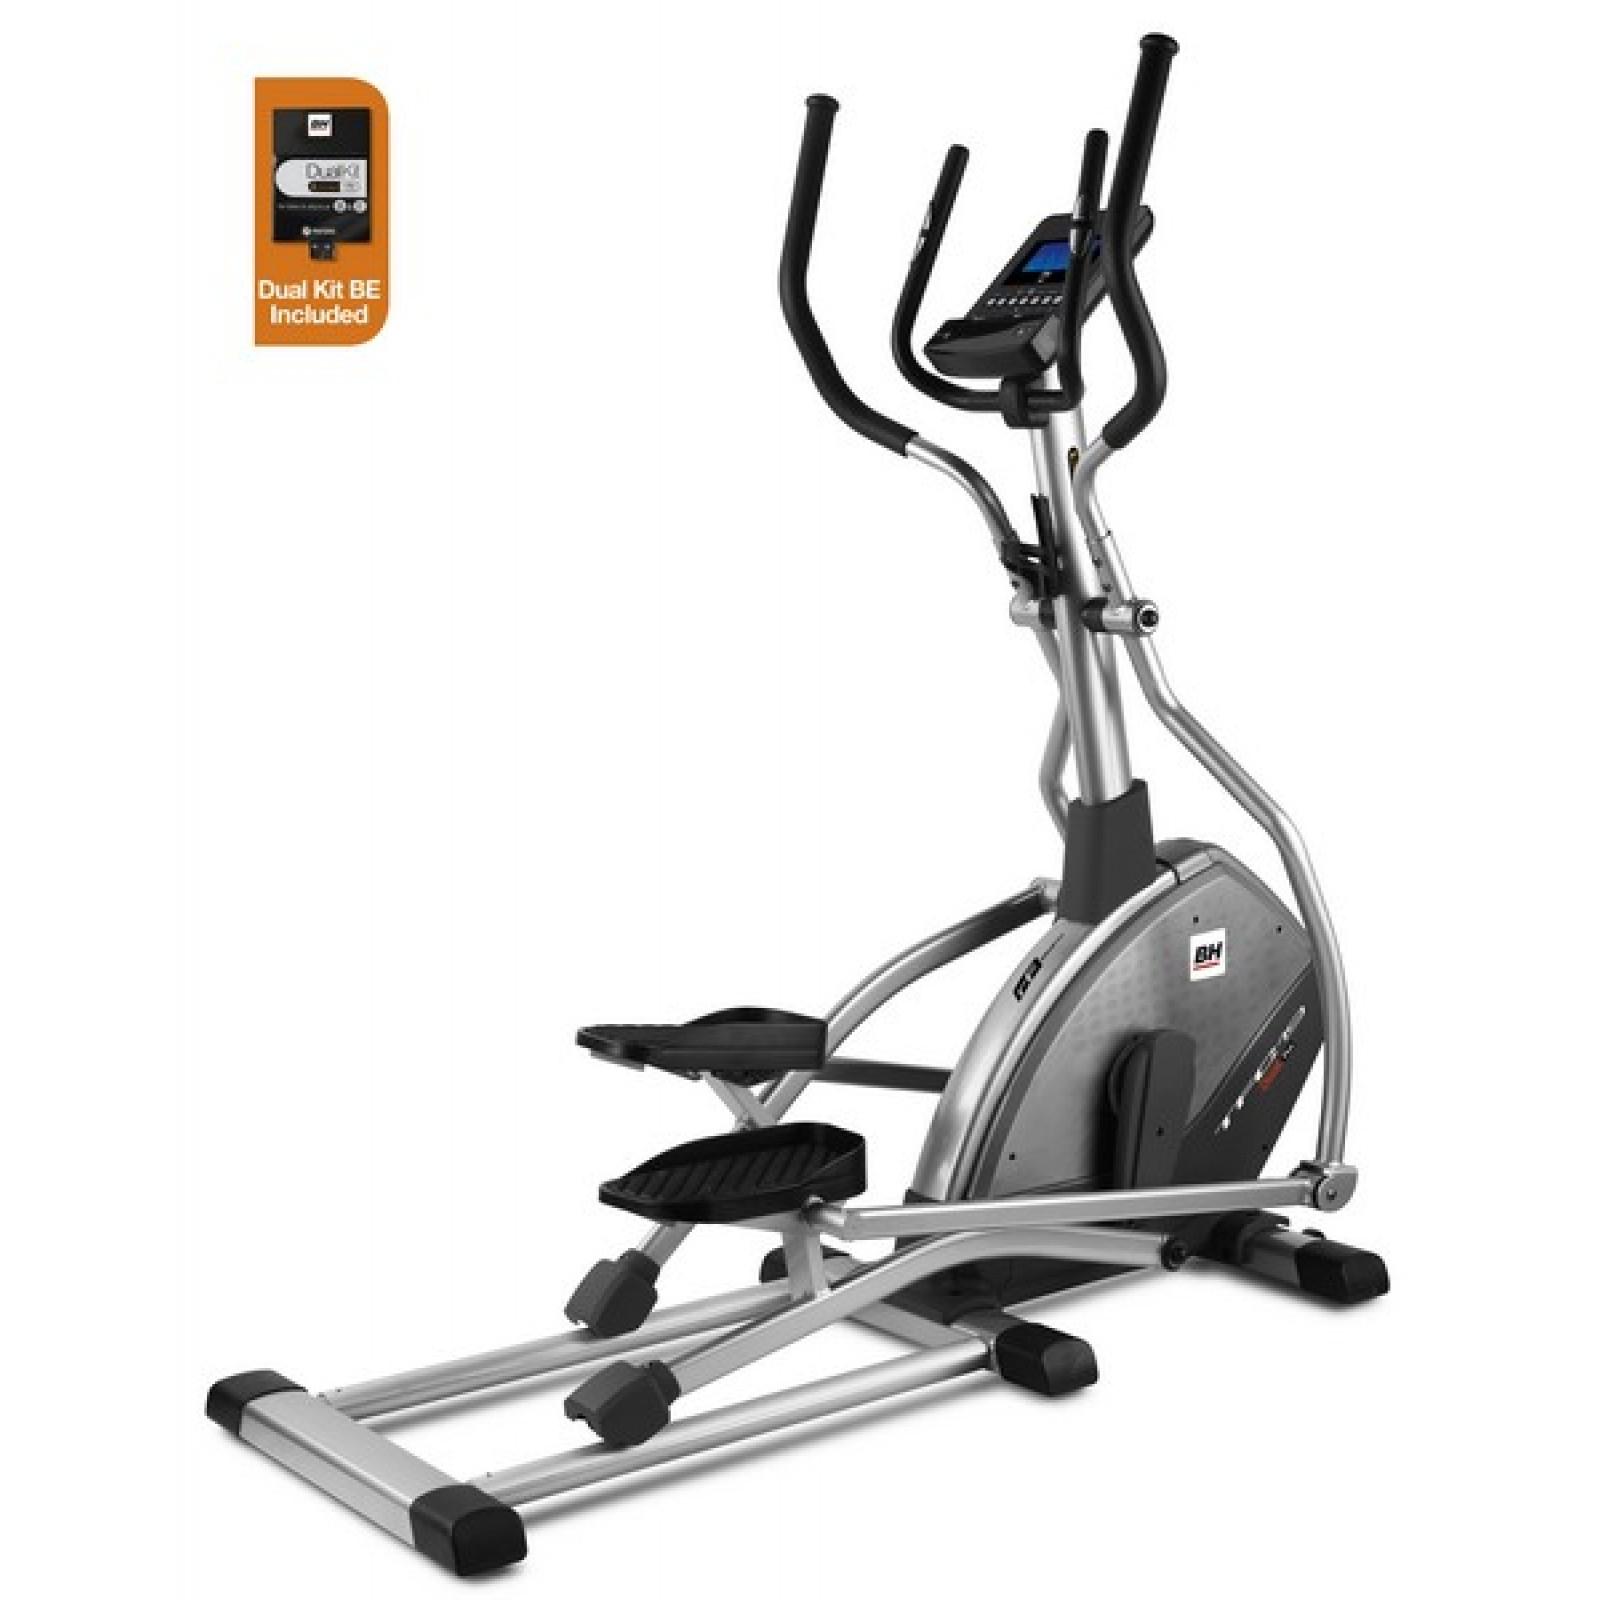 Эллиптический тренажер BH Fitness TFC 19 Dual Plus + Dual Kit